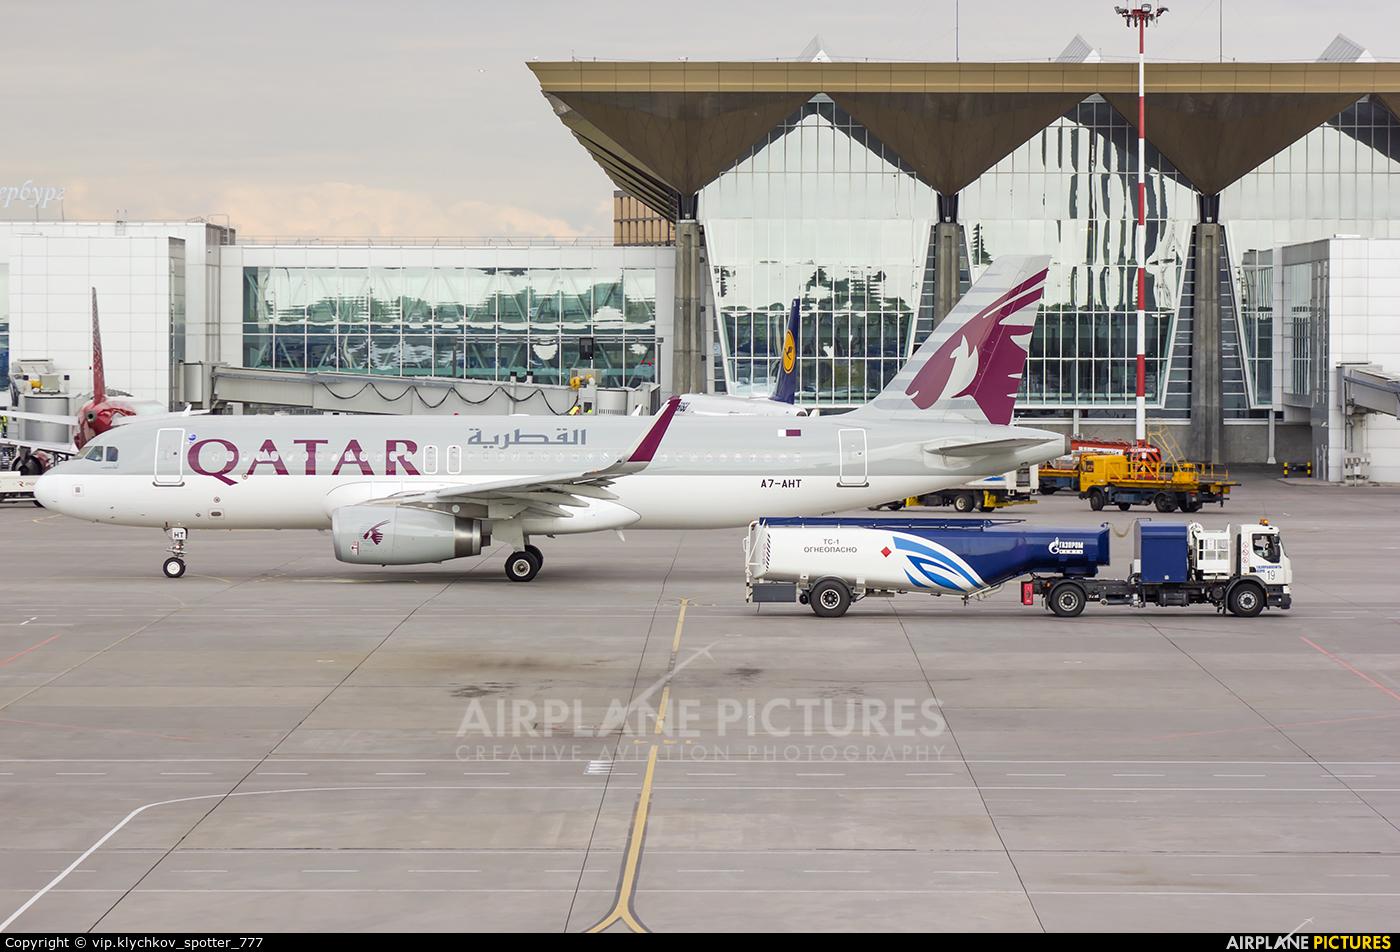 Qatar Airways A7-AHT aircraft at St. Petersburg - Pulkovo